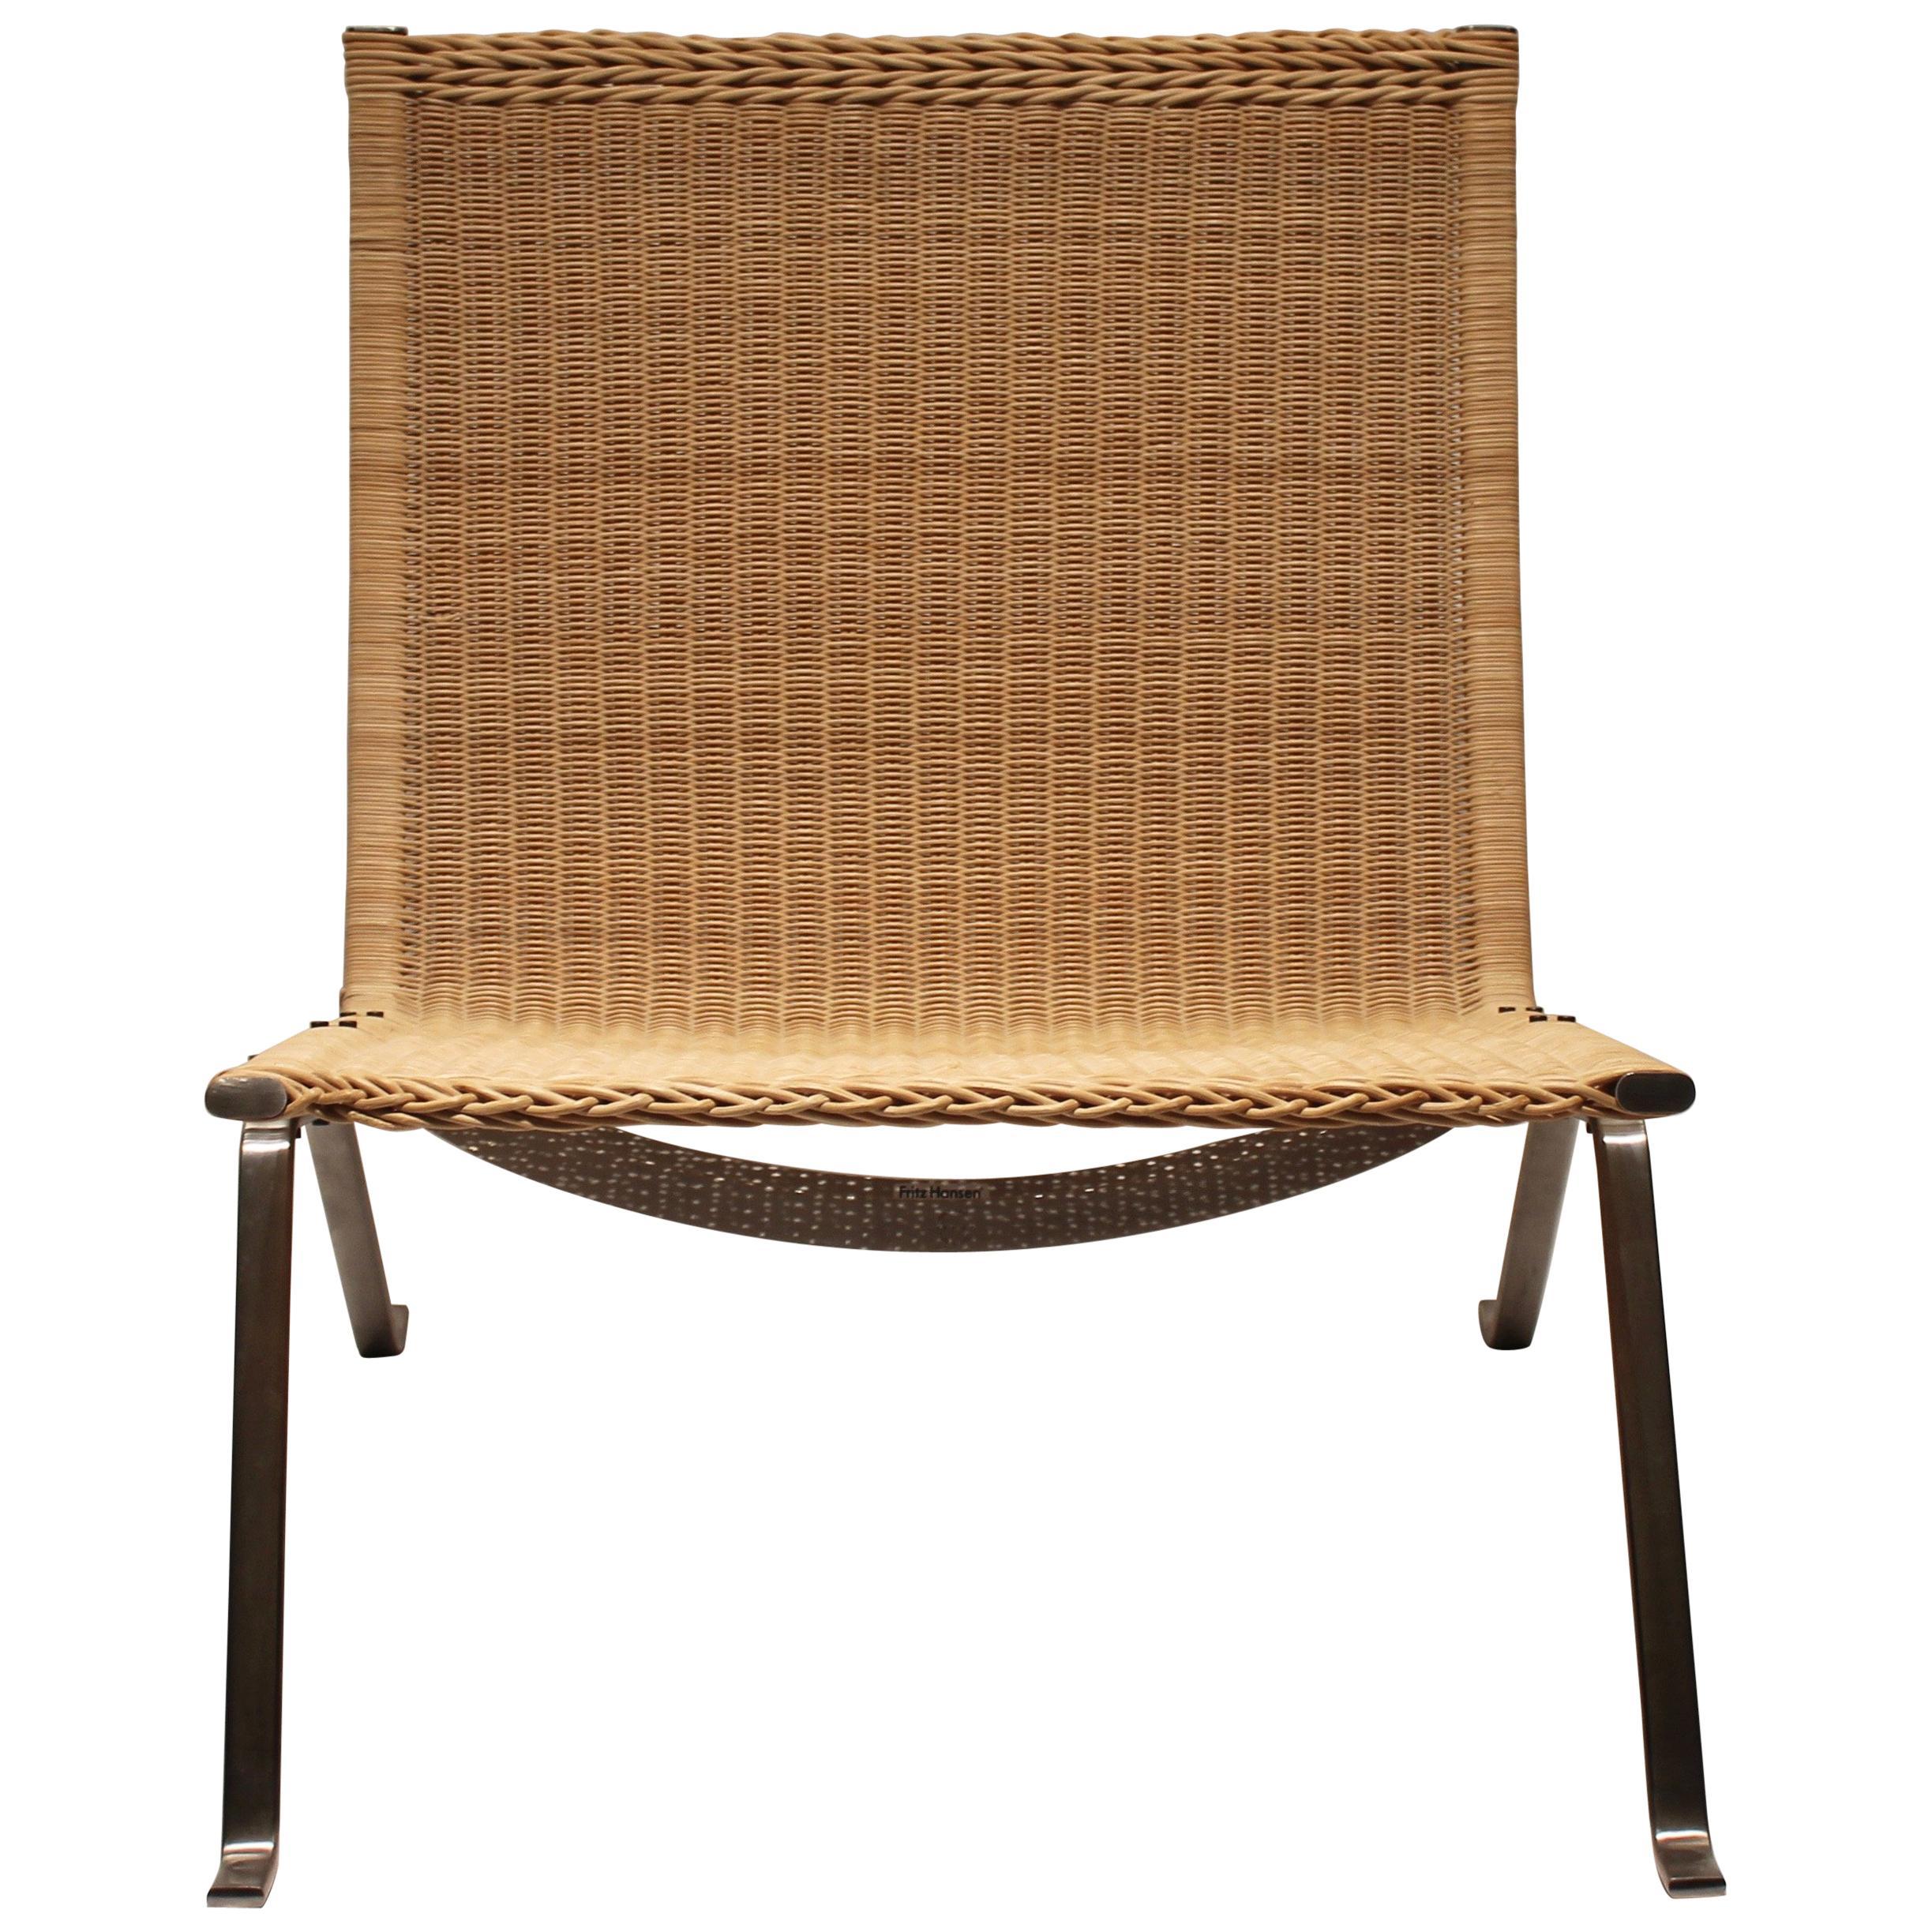 Easy Chair, Model Pk22, Designed by Poul Kjærholm, 2000